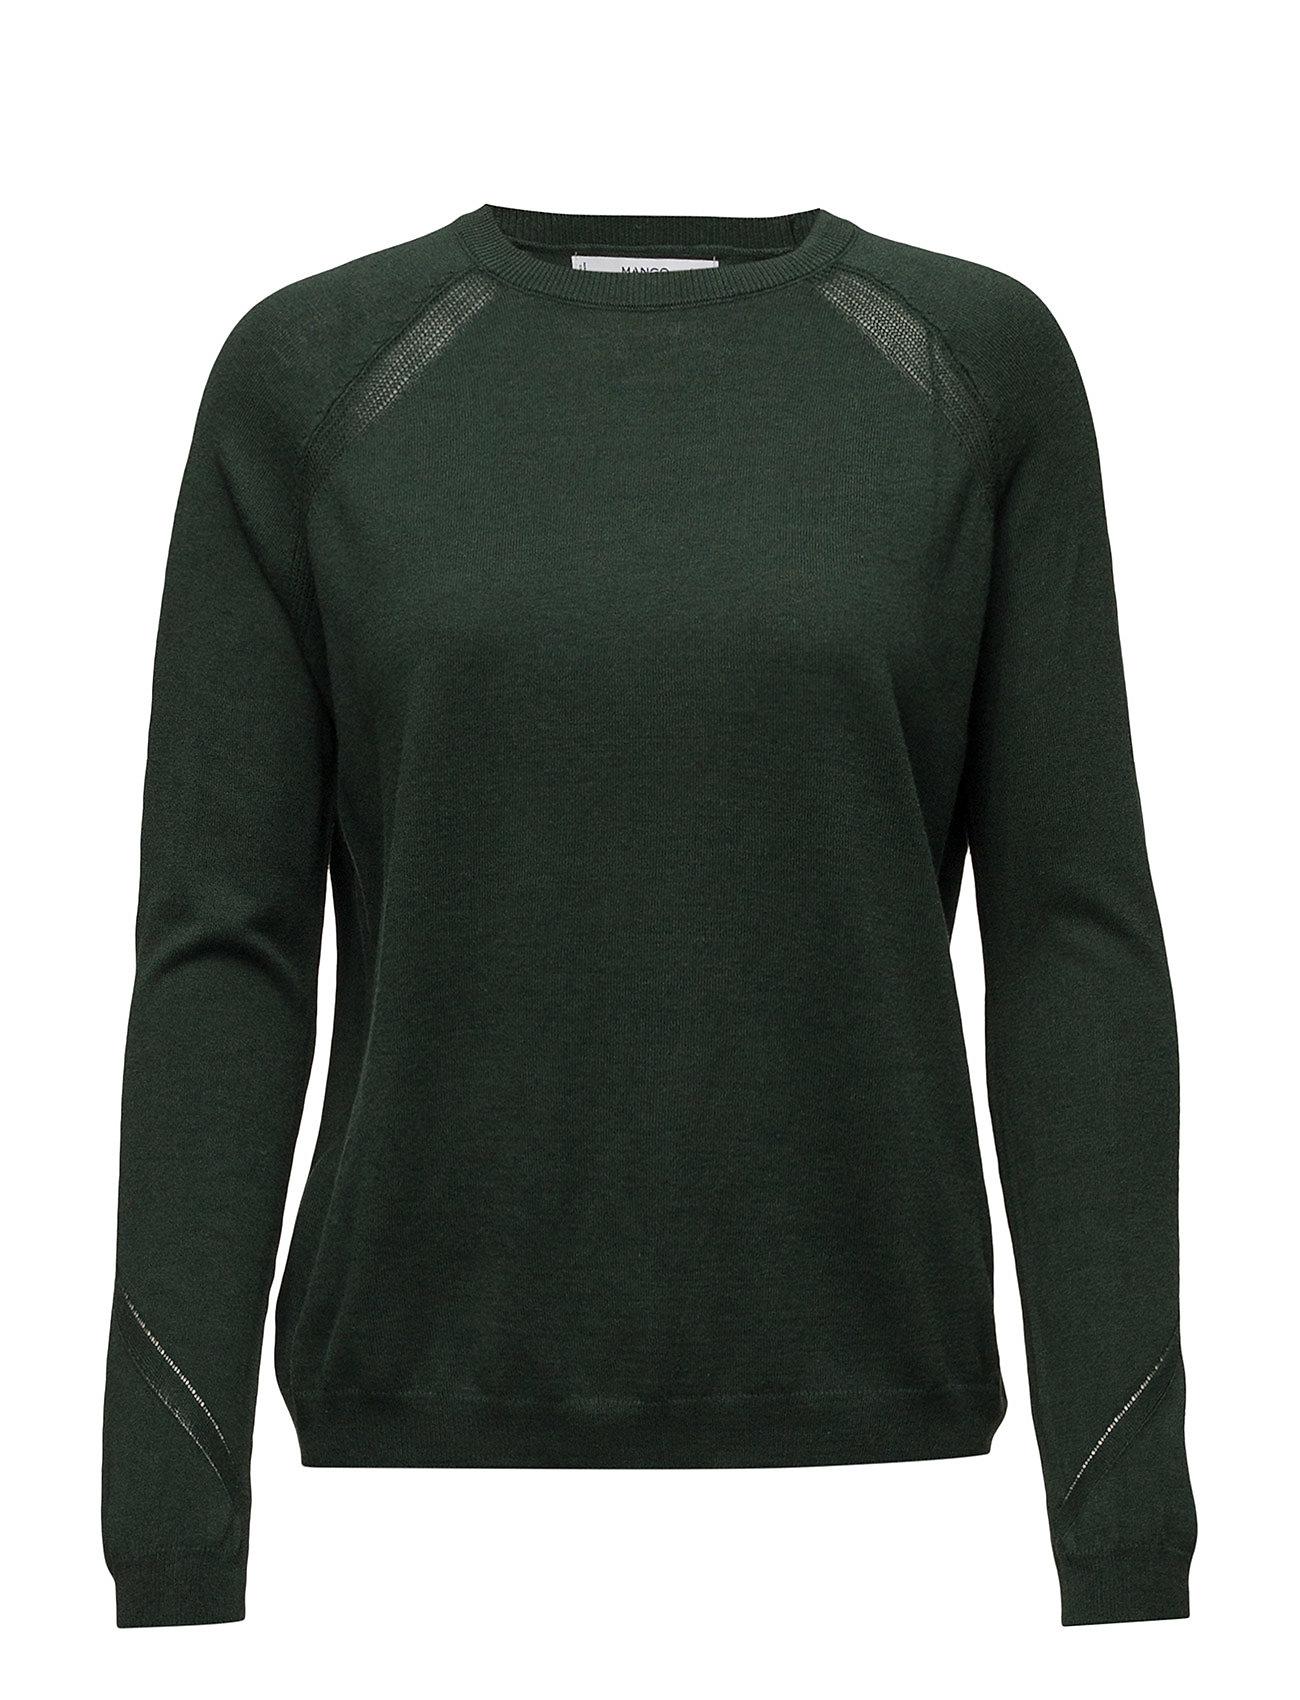 Decorative Seams Cotton Sweater Mango Sweatshirts til Damer i Mørkegrøn